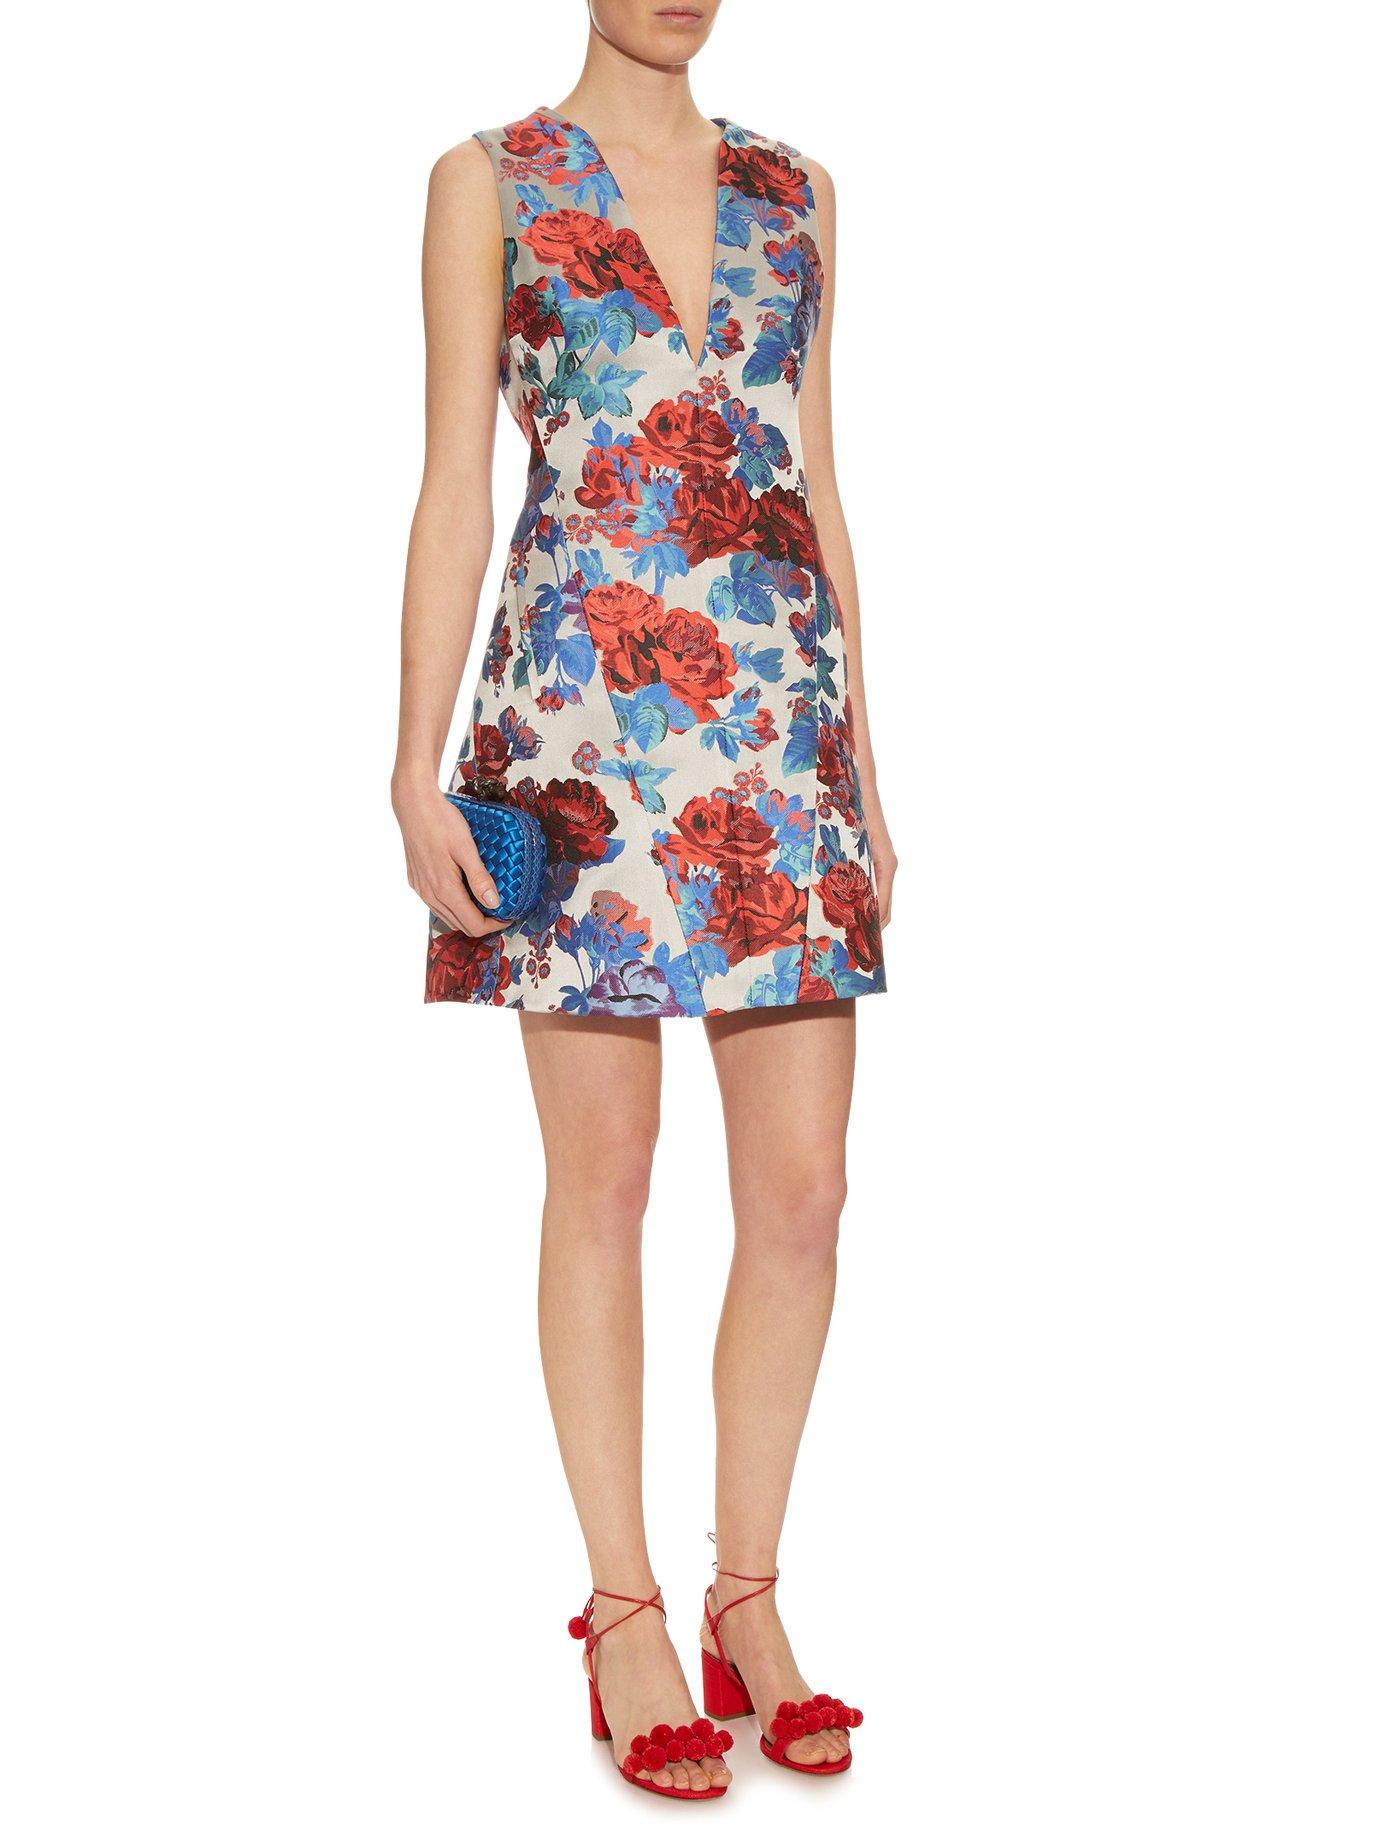 Eridanus floral-jacquard V-neck dress by Mary Katrantzou